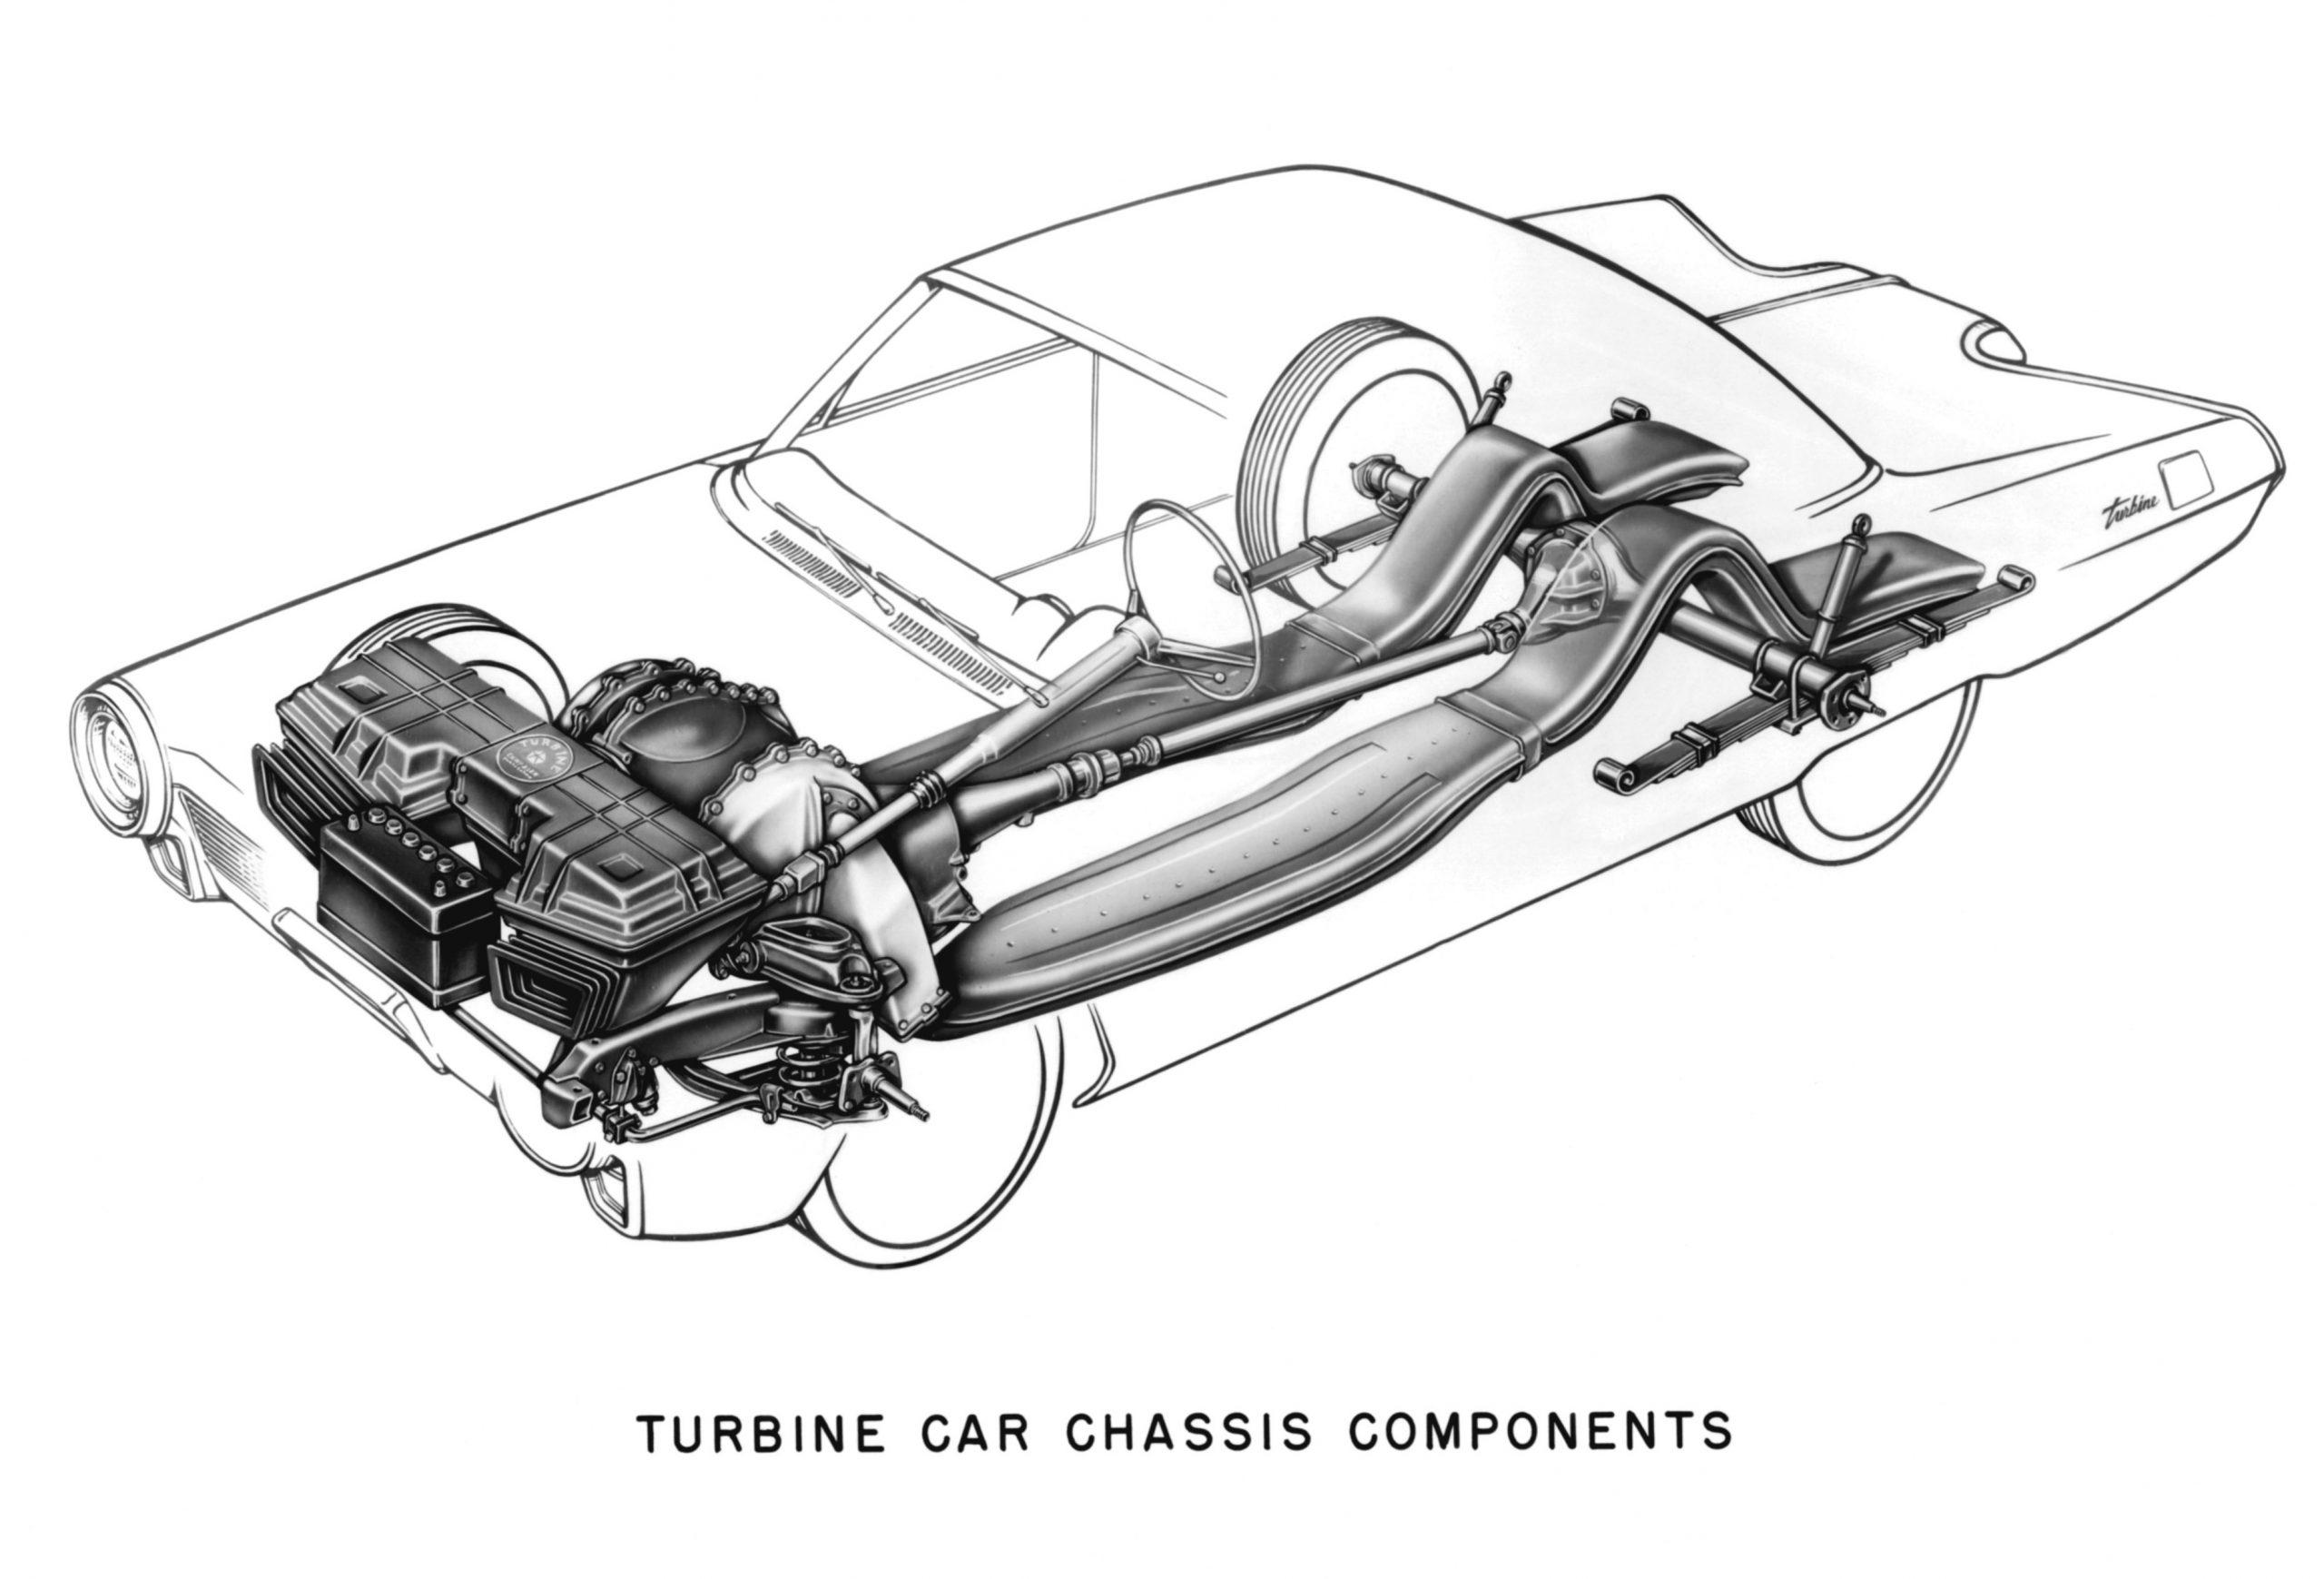 Chrysler Turbine history - 1963 Chrysler Turbine cutaway